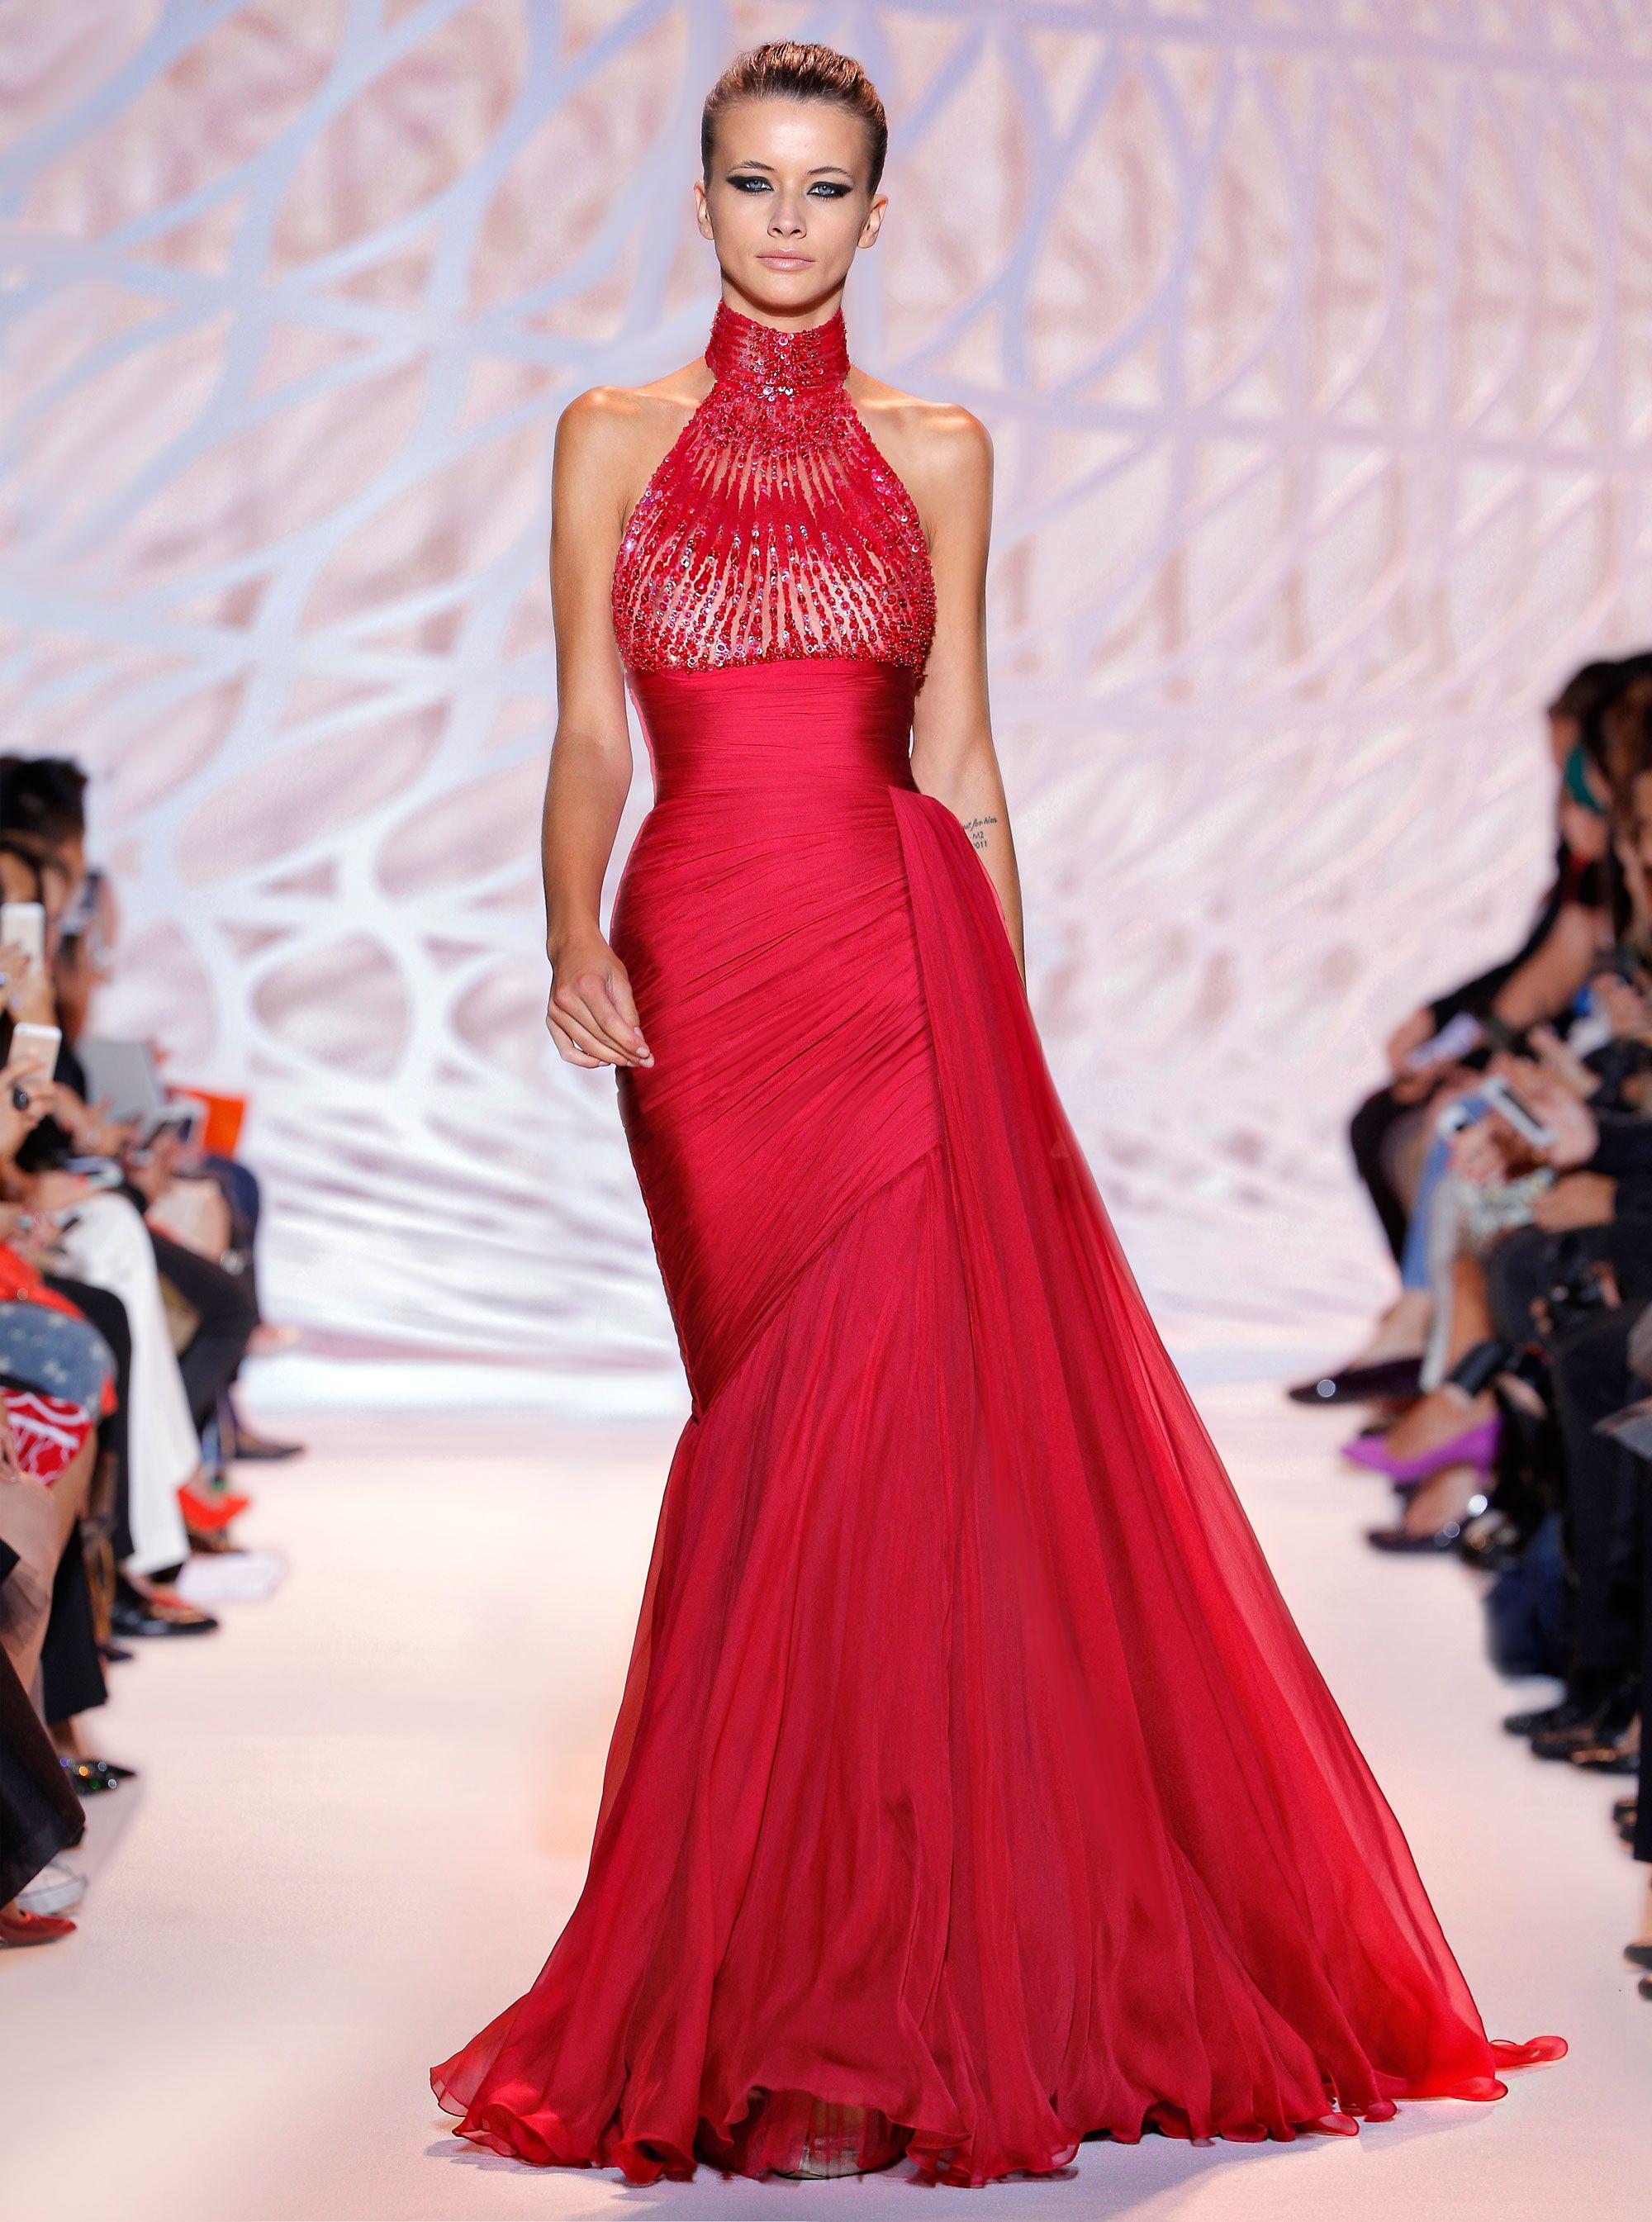 f76c5892102 zuhair murad Haute couture fall winter 2015 collection (21). zuhair murad  Haute couture fall winter 2015 collection (21) Evening Gowns 2016 ...